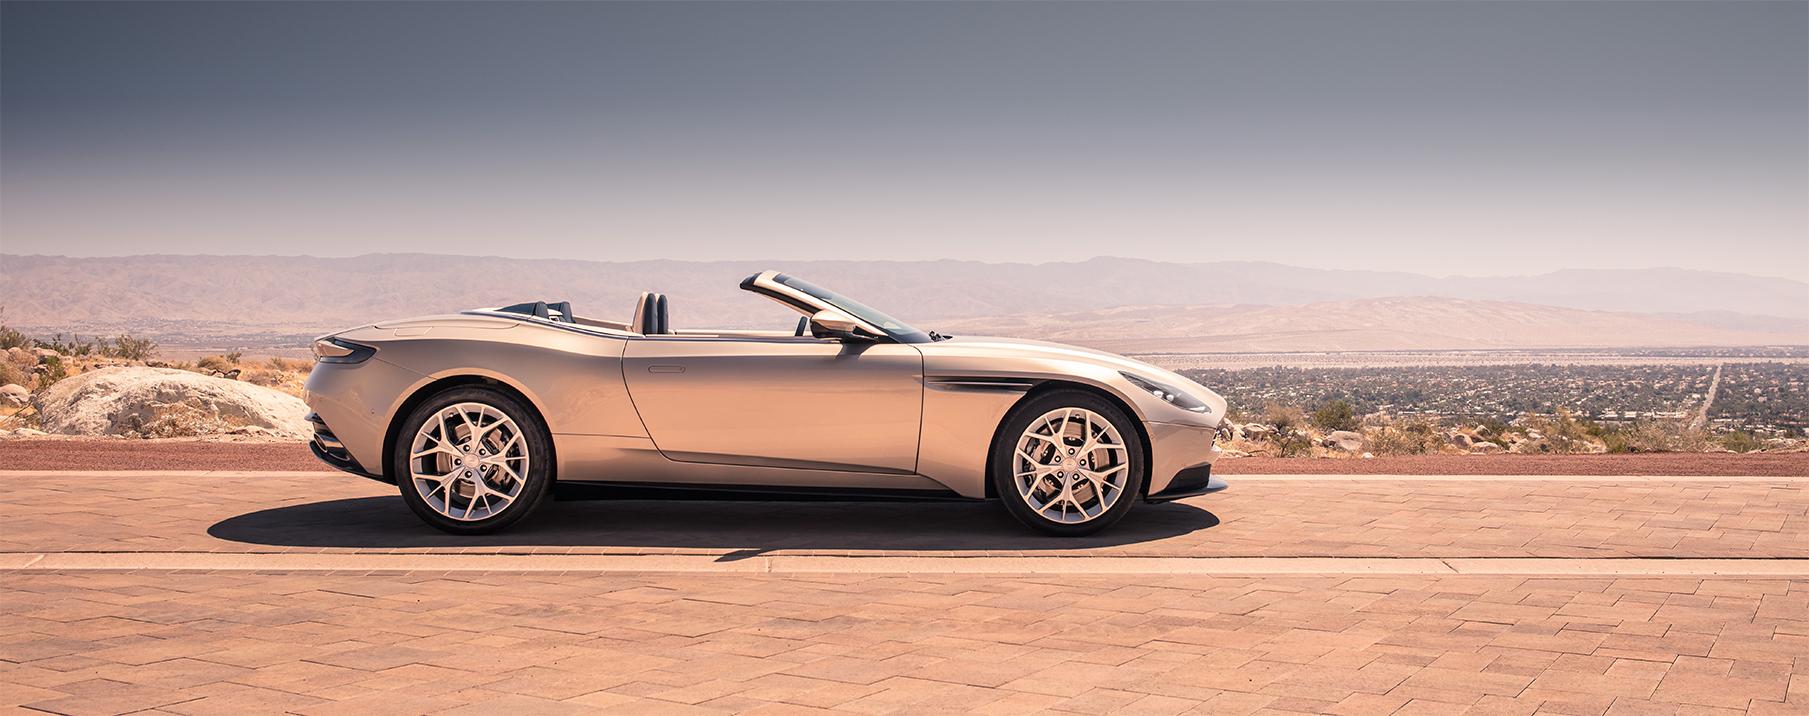 TrackWorthy - Aston Martin DB11 Volante (24)